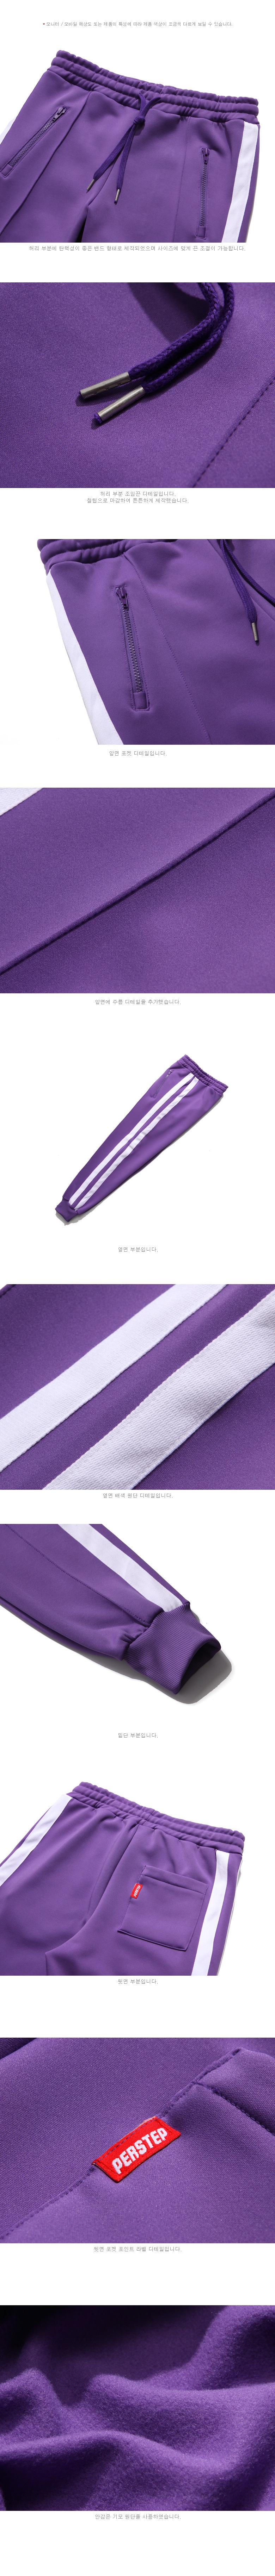 20180730_ps_swingwave_jogger_purple_uk_02.jpg